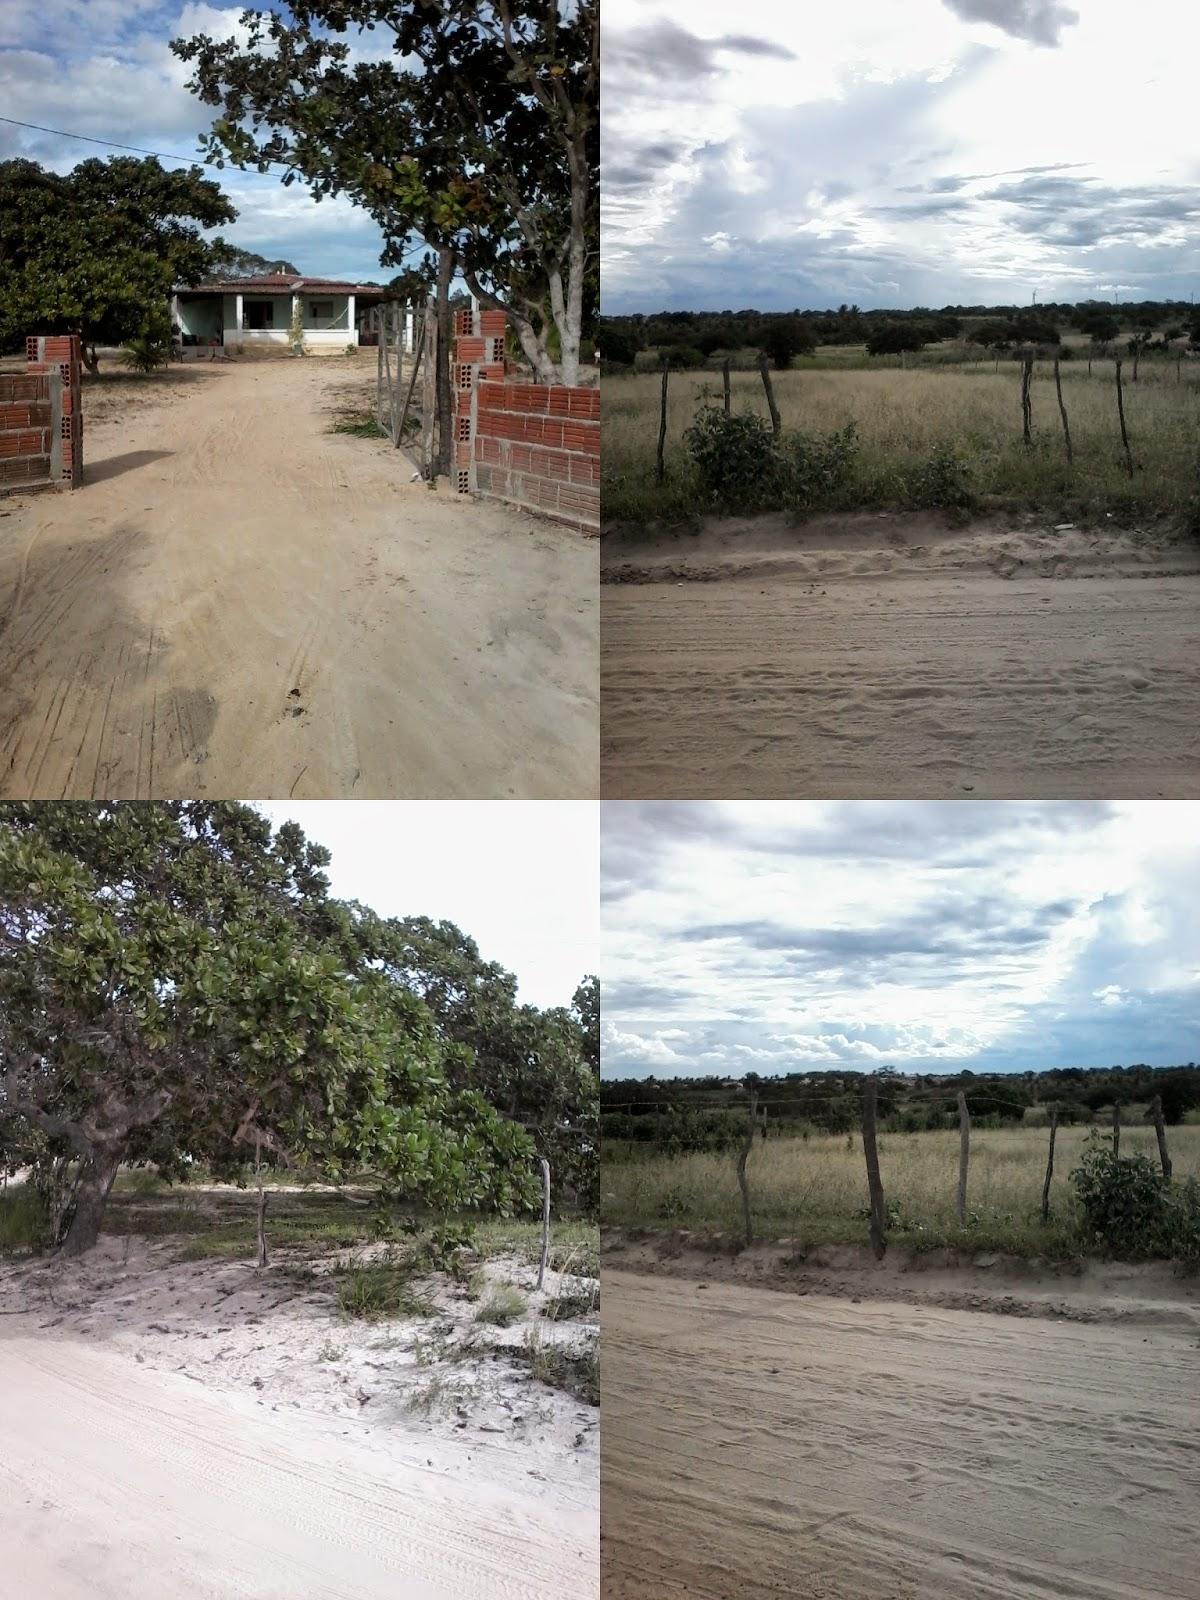 http://blogdoedmilsonsousa.blogspot.com.br/2015/05/vende-se-lotes-terrenos-e-casa-em-lagoa_2.html